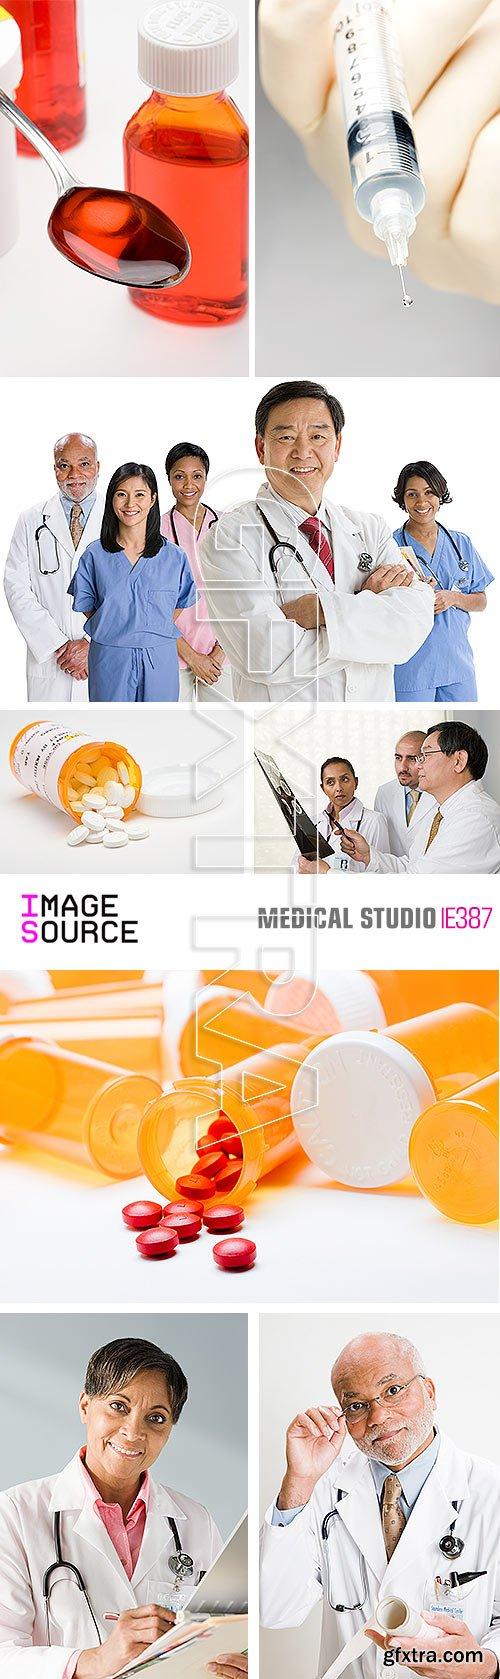 Image Source IE387 Medical Studio